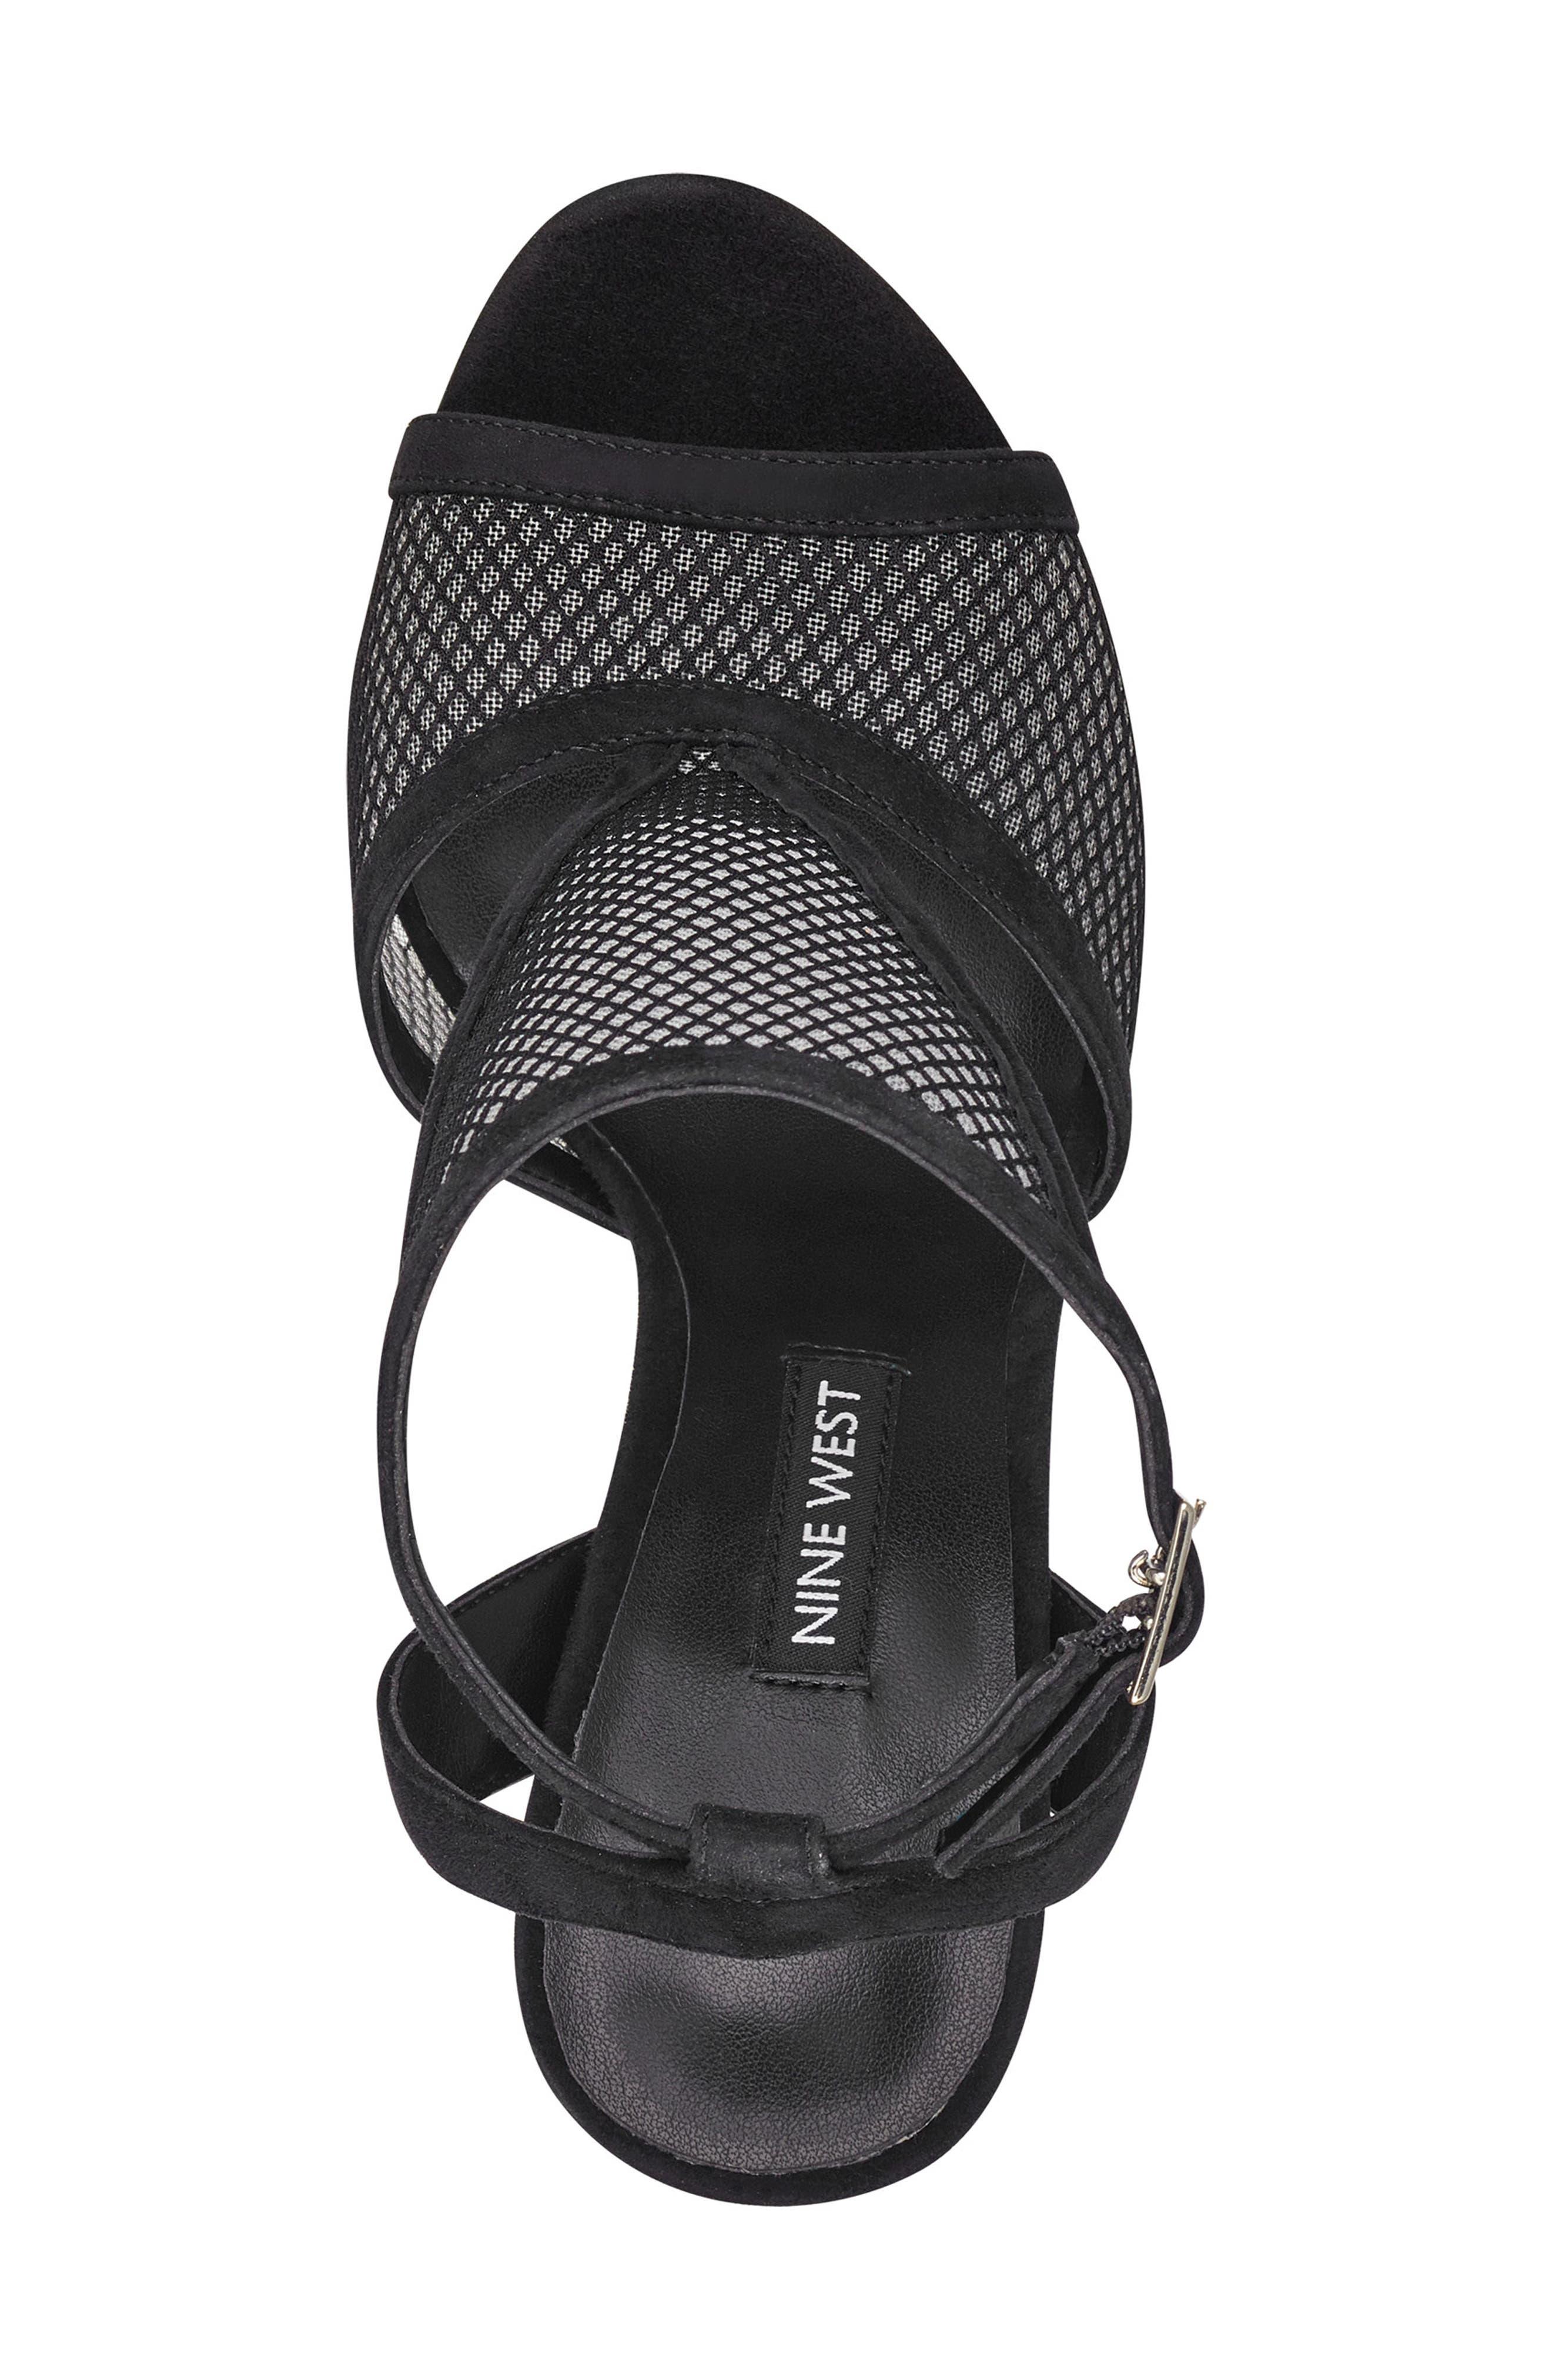 Manchon 2 Ankle Strap Sandal,                             Alternate thumbnail 5, color,                             BLACK STRETCH MESH/ LEATHER